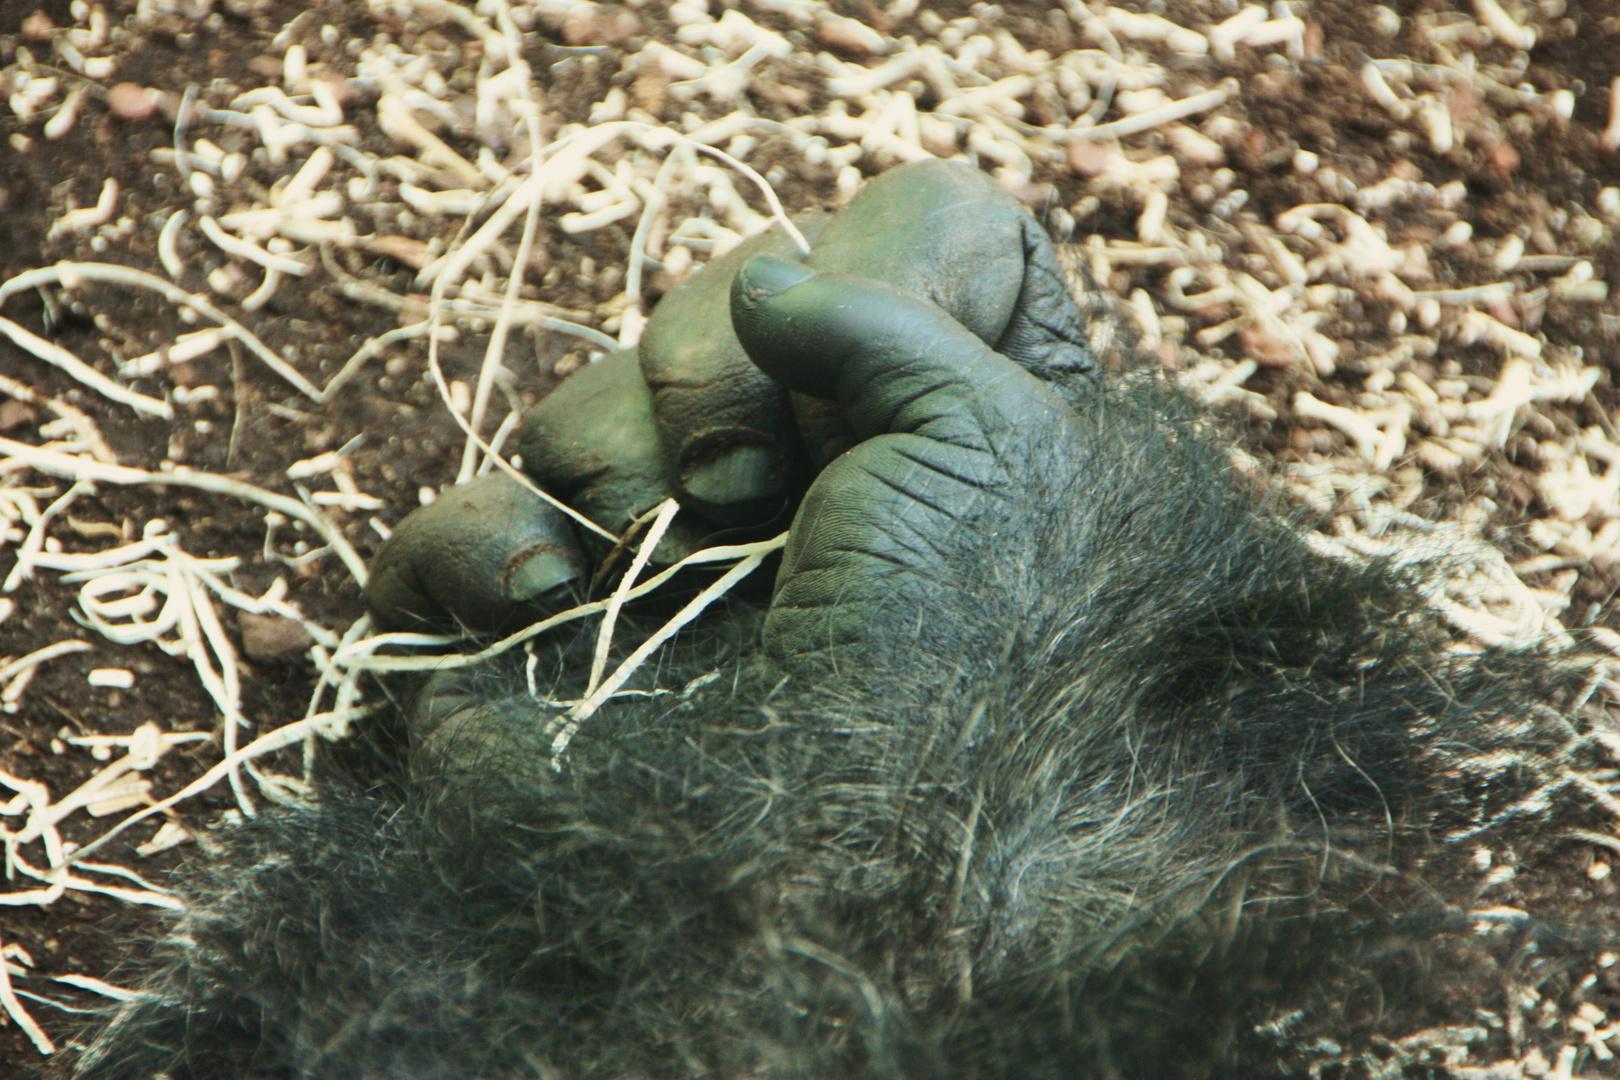 Gorilla Faust